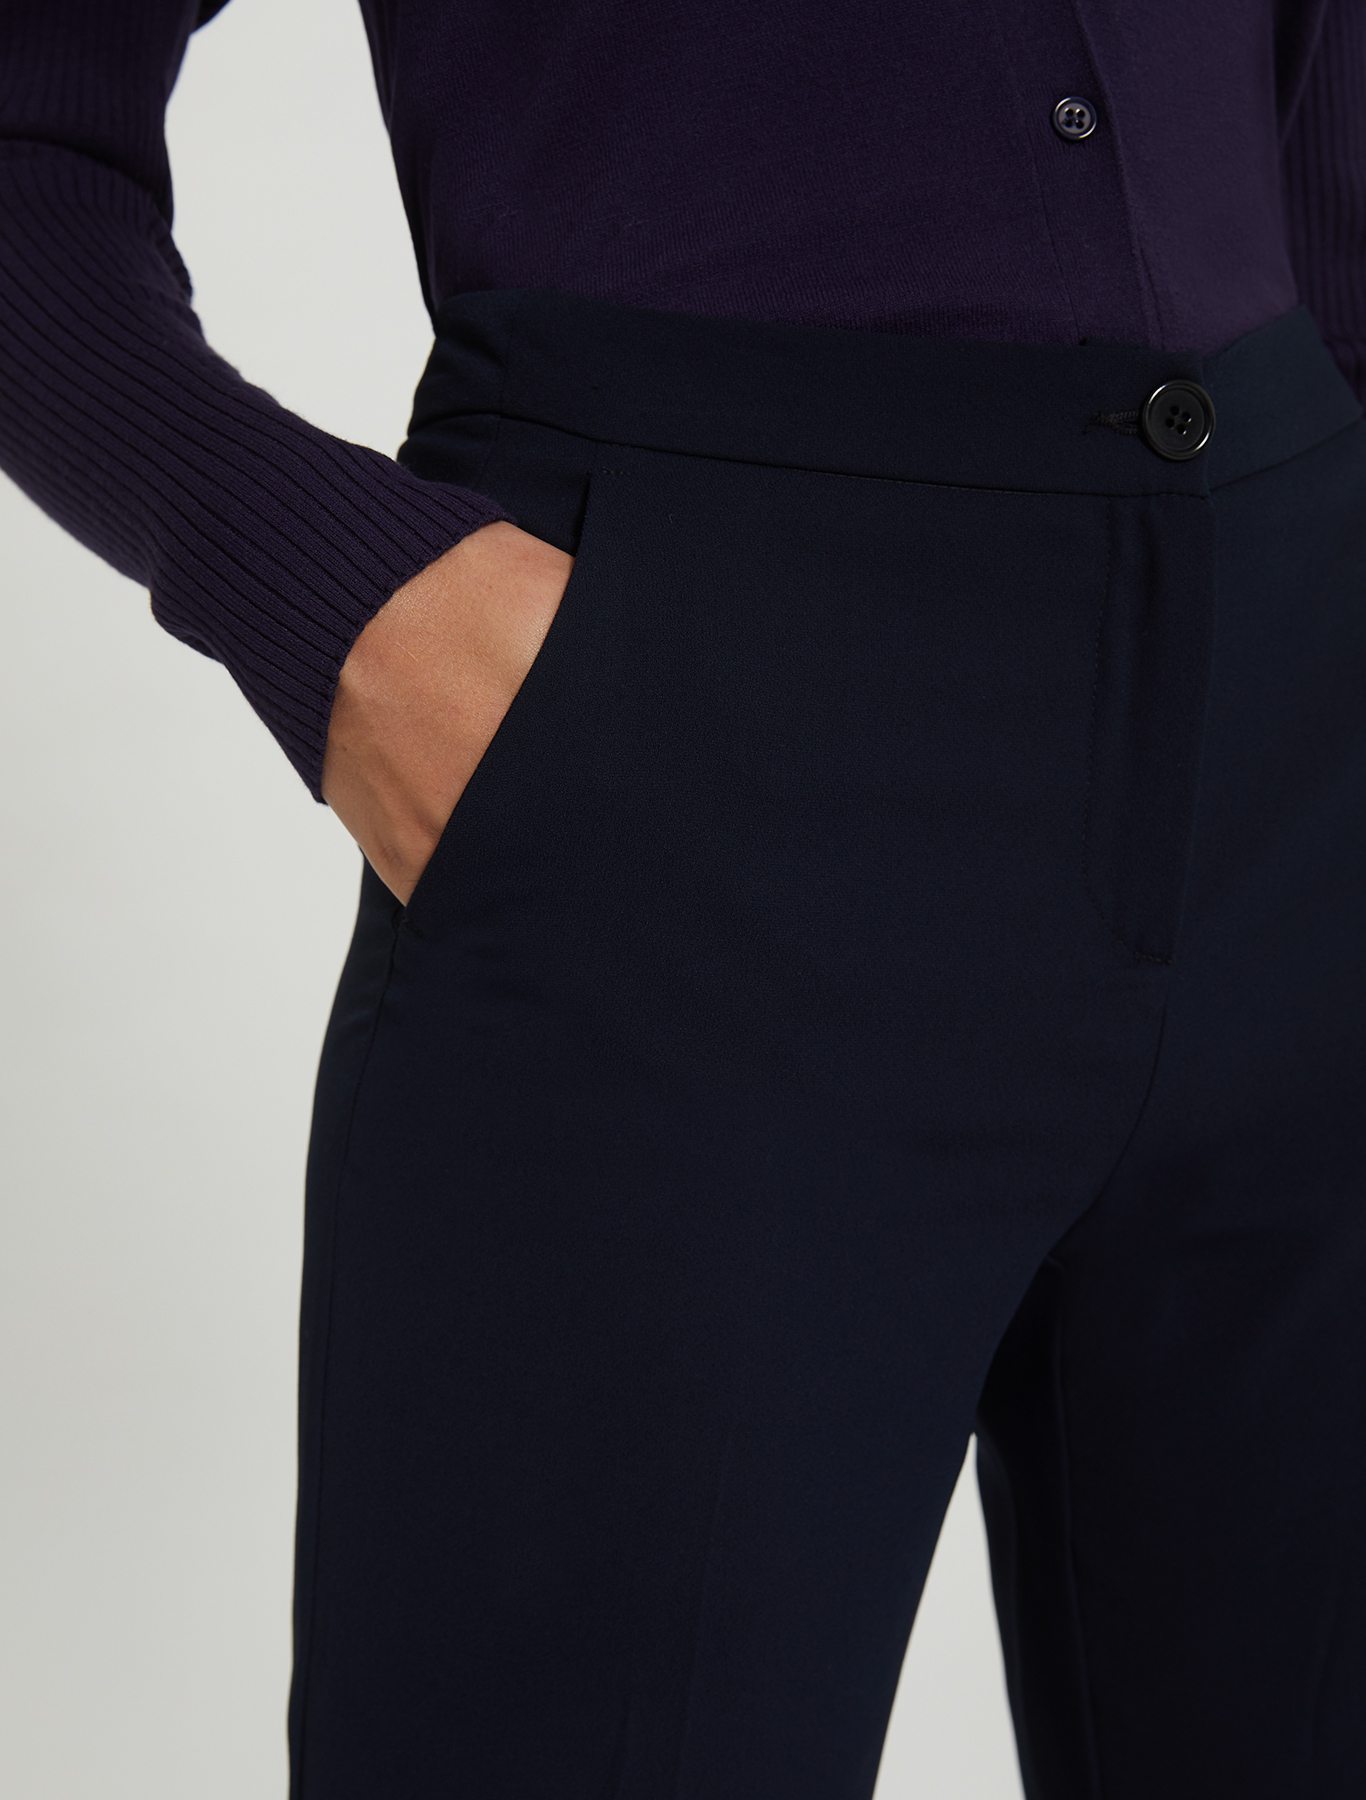 Envers satin trousers - navy blue - pennyblack